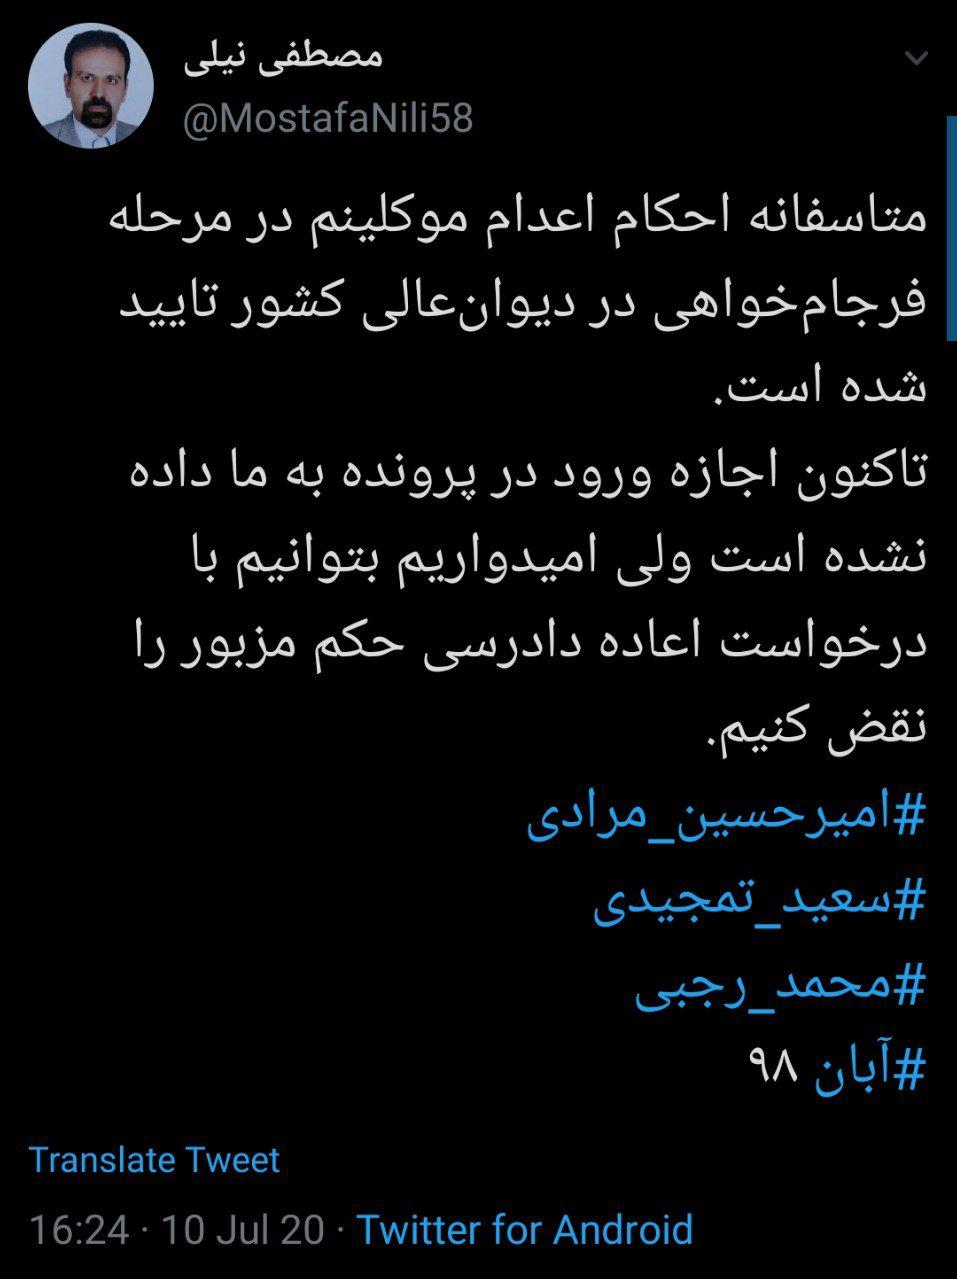 حکم اعدام سه معترض #آبان۹۸ ت … 019045001594391405